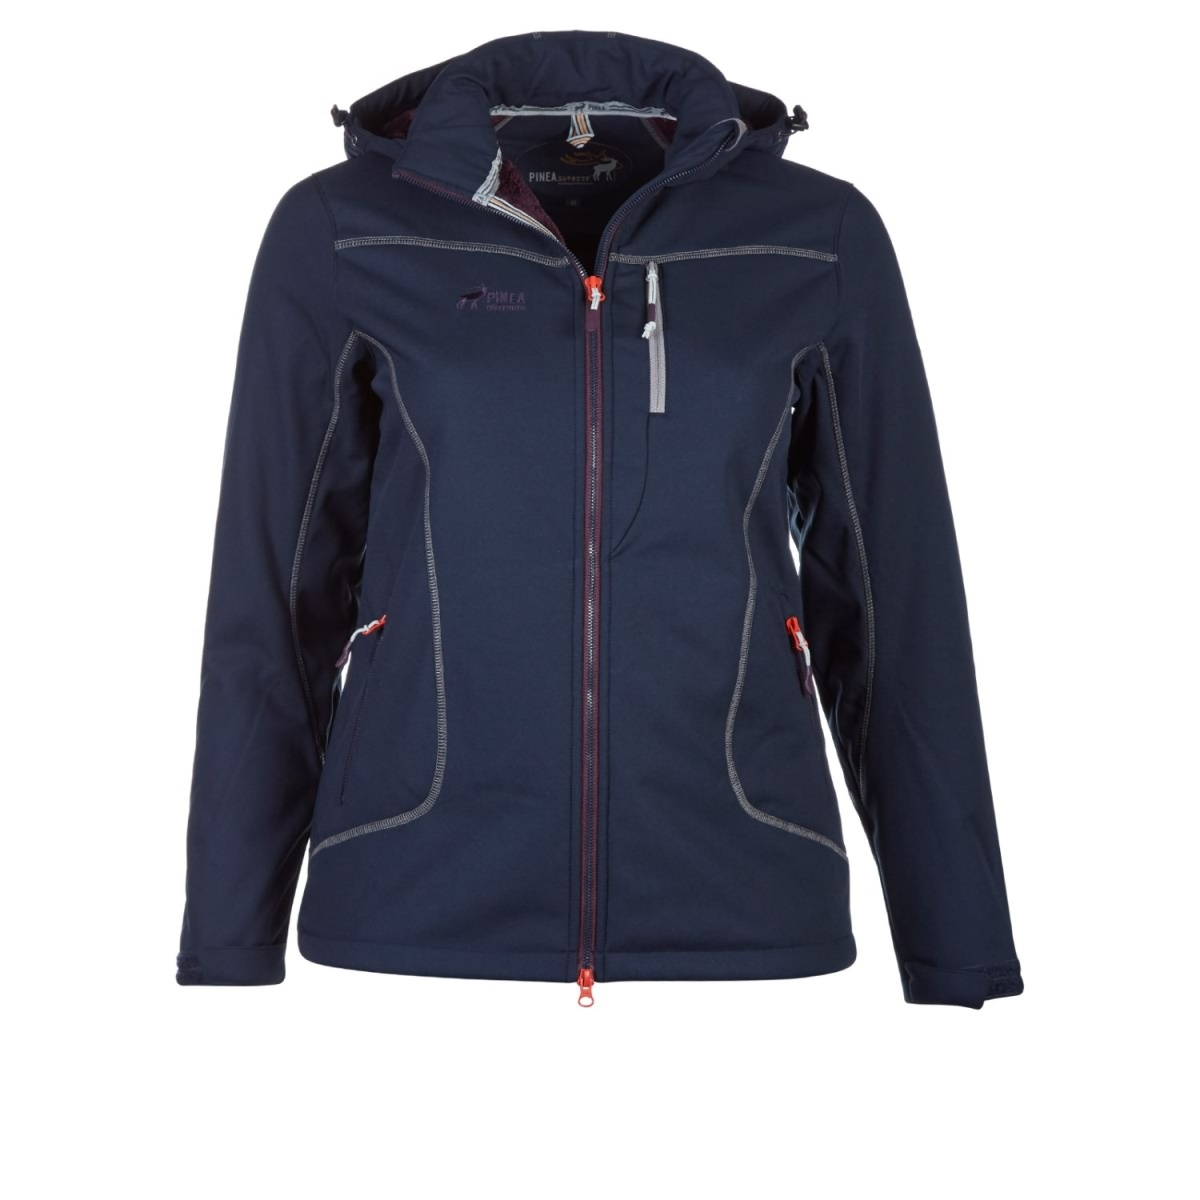 Softshell Jacke Temperaturbereich